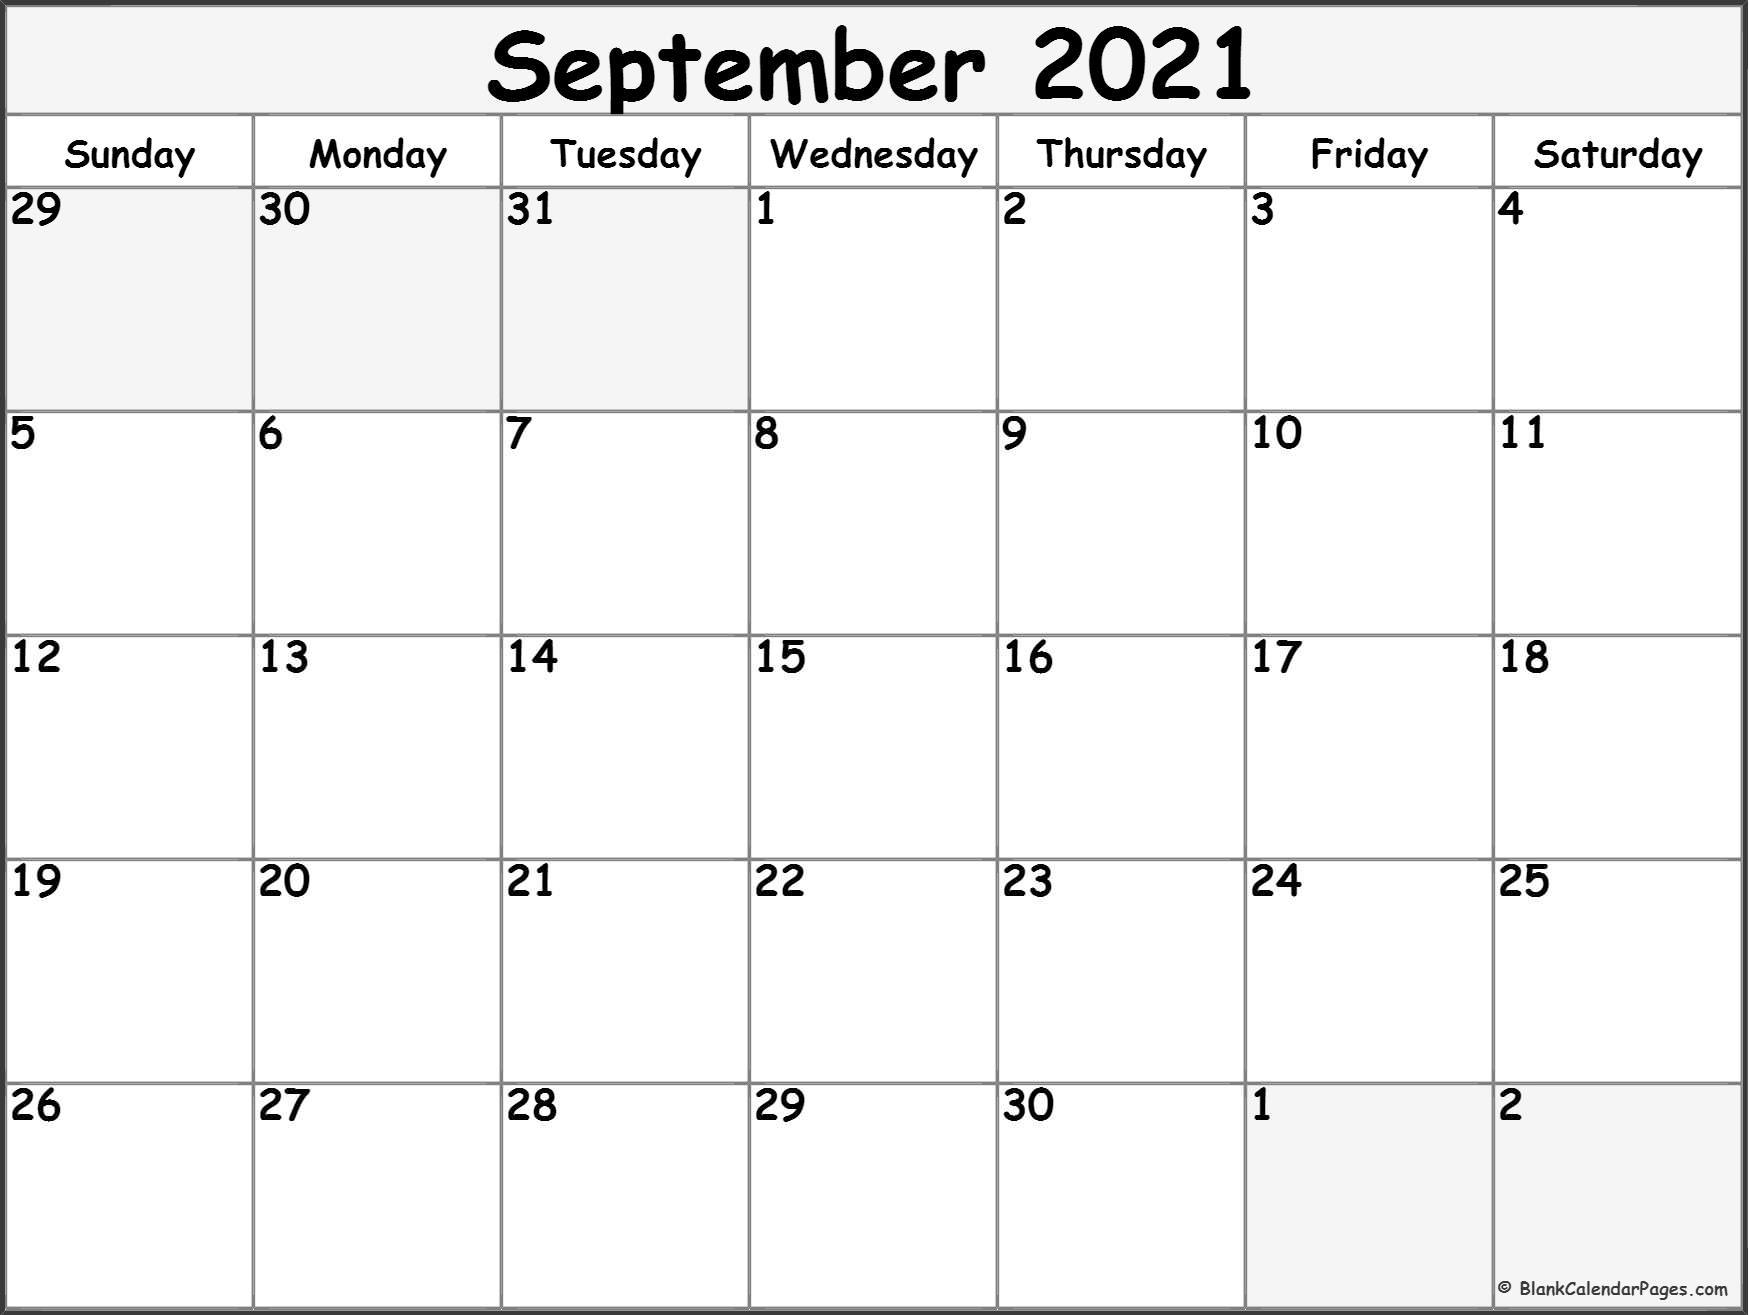 September 2021 Blank Calendar Templates.